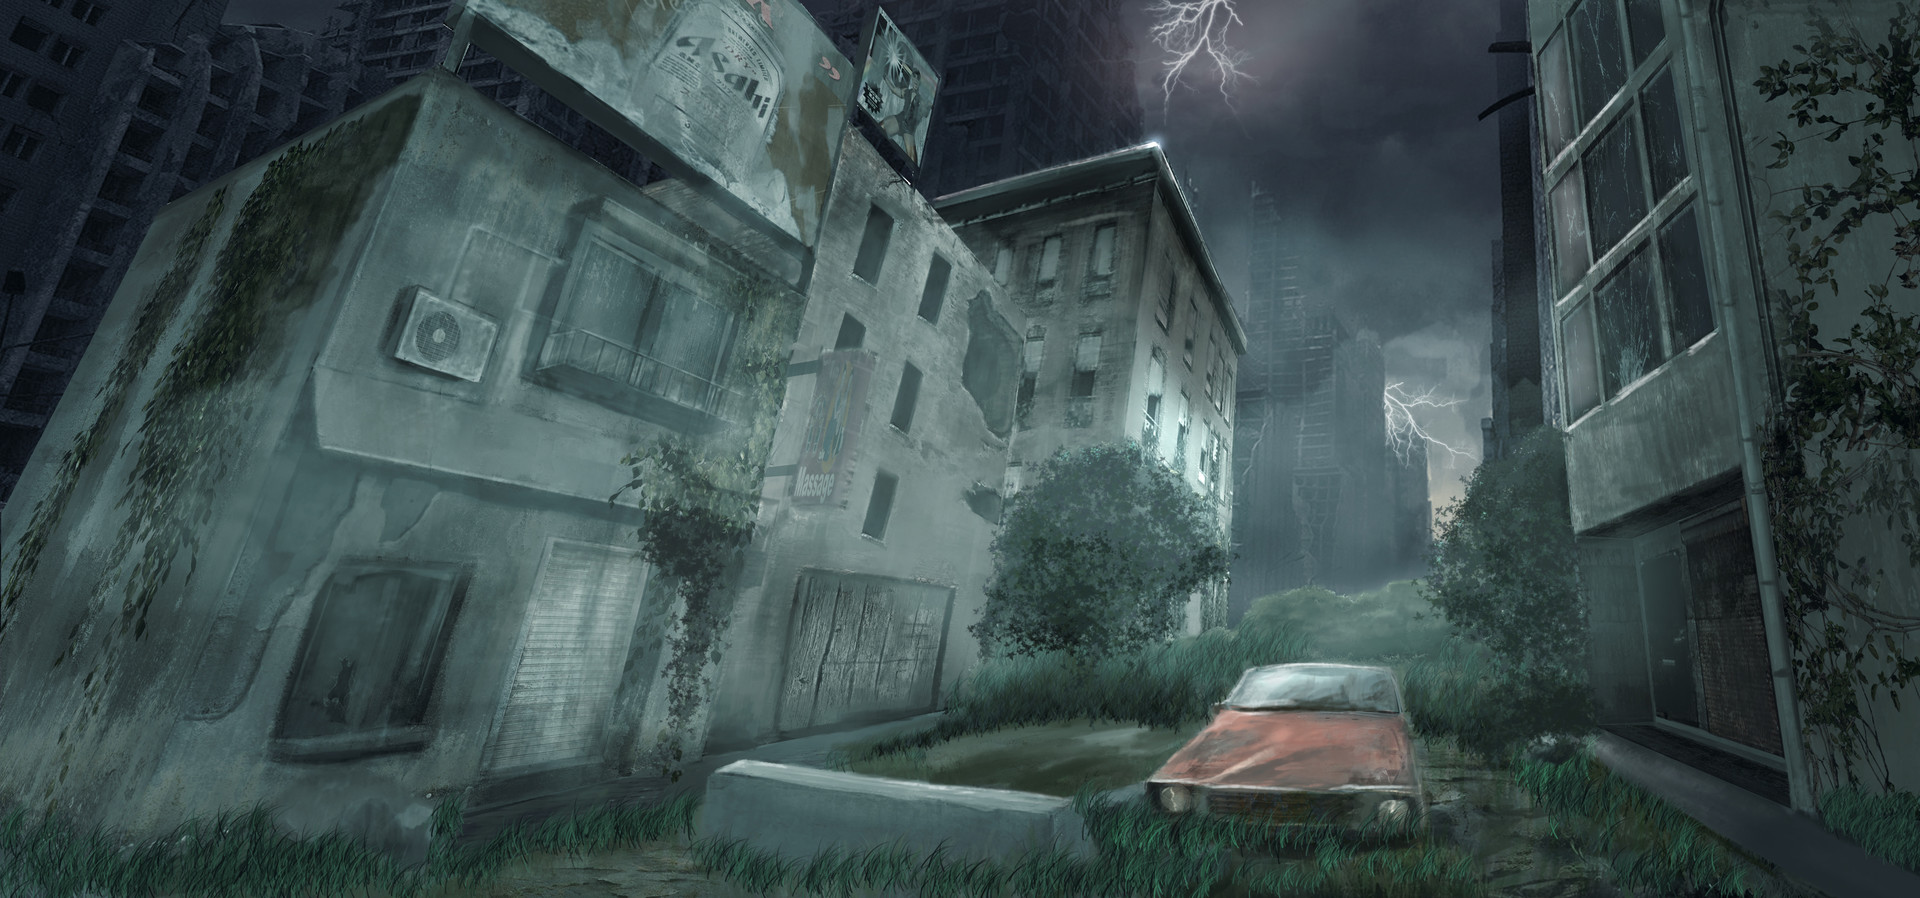 https://cdnb.artstation.com/p/assets/images/images/008/815/147/large/gillbert-tan-3-point-apocalypse-background-final-2.jpg?1515488247